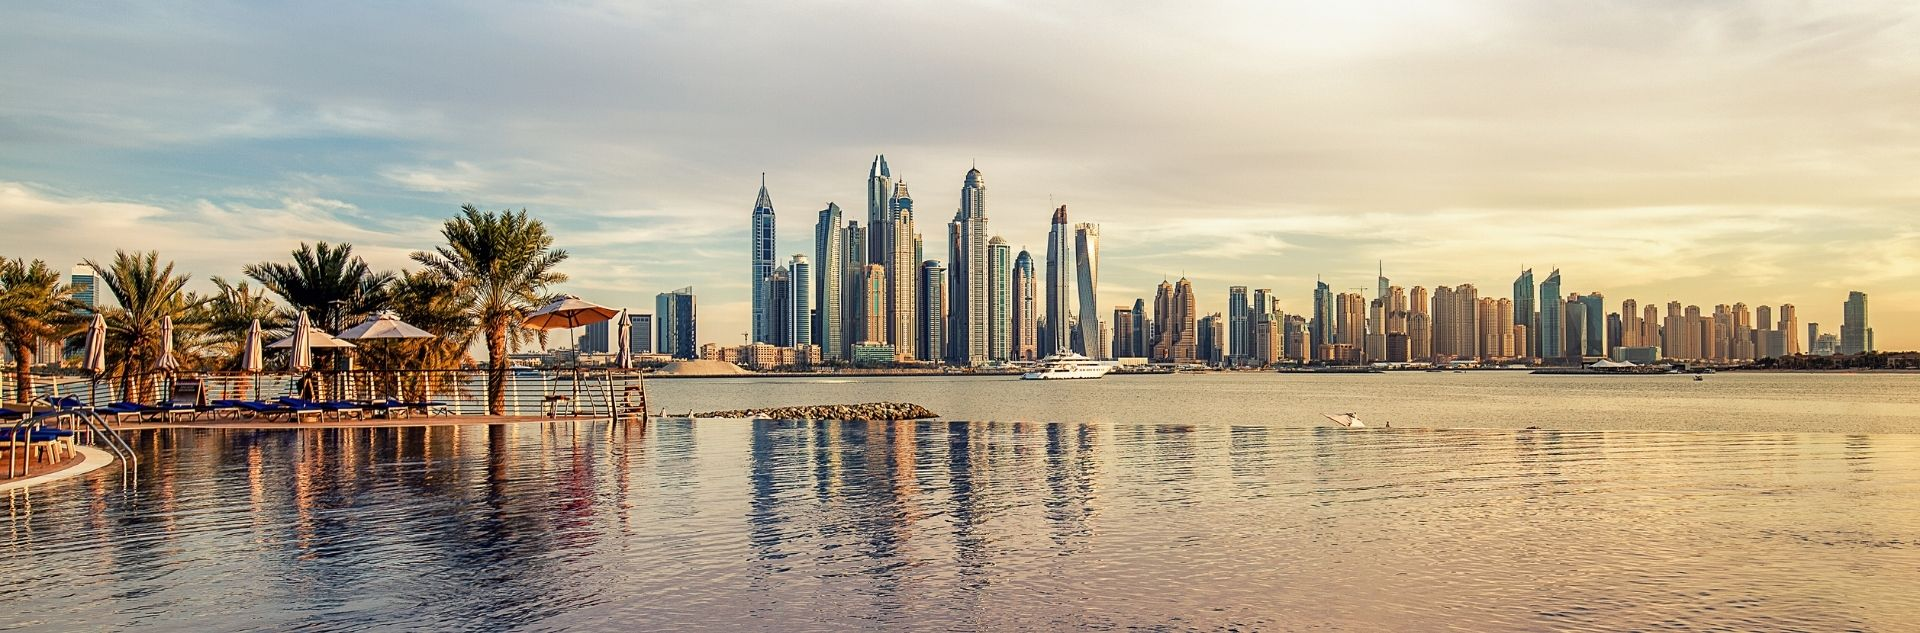 Arabische Emirate